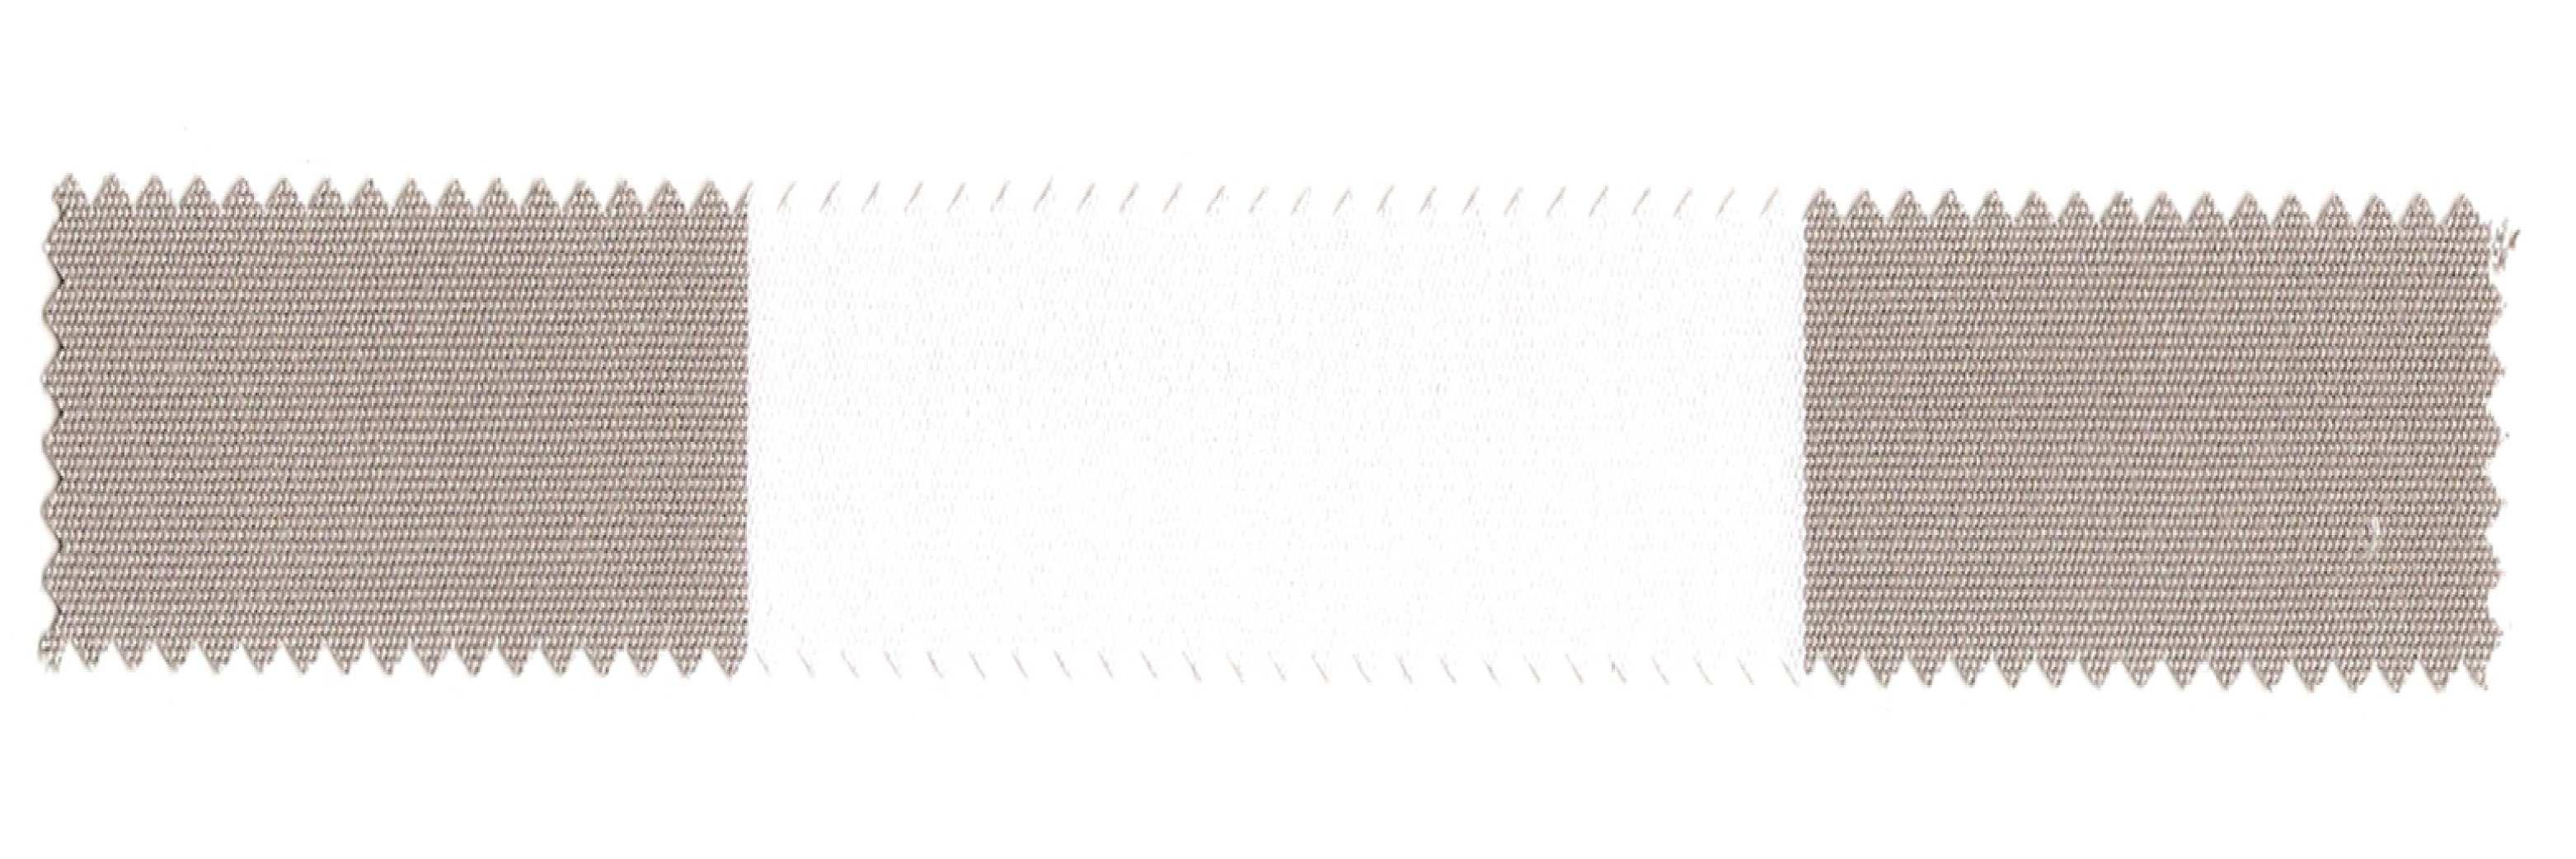 SATTLER ELEMENTS BLOCK STRIPES Gray-White